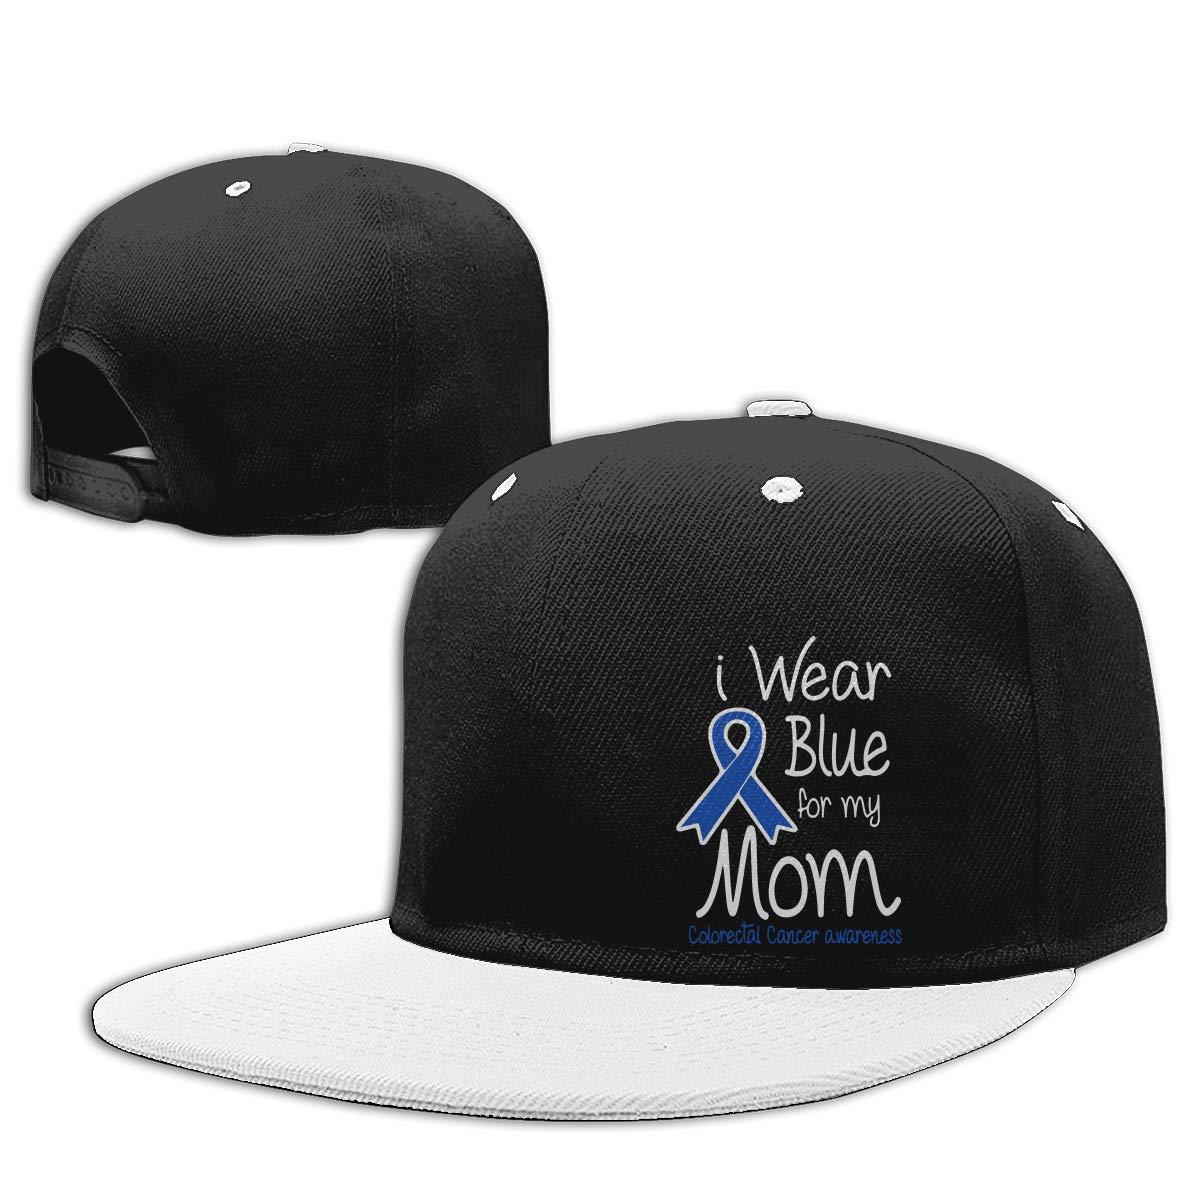 NMG-01 Men Womens Plain Cap I Wear Blue for My Mom Colorectal Cancer Awareness Fashion Hip Hop Baseball Caps